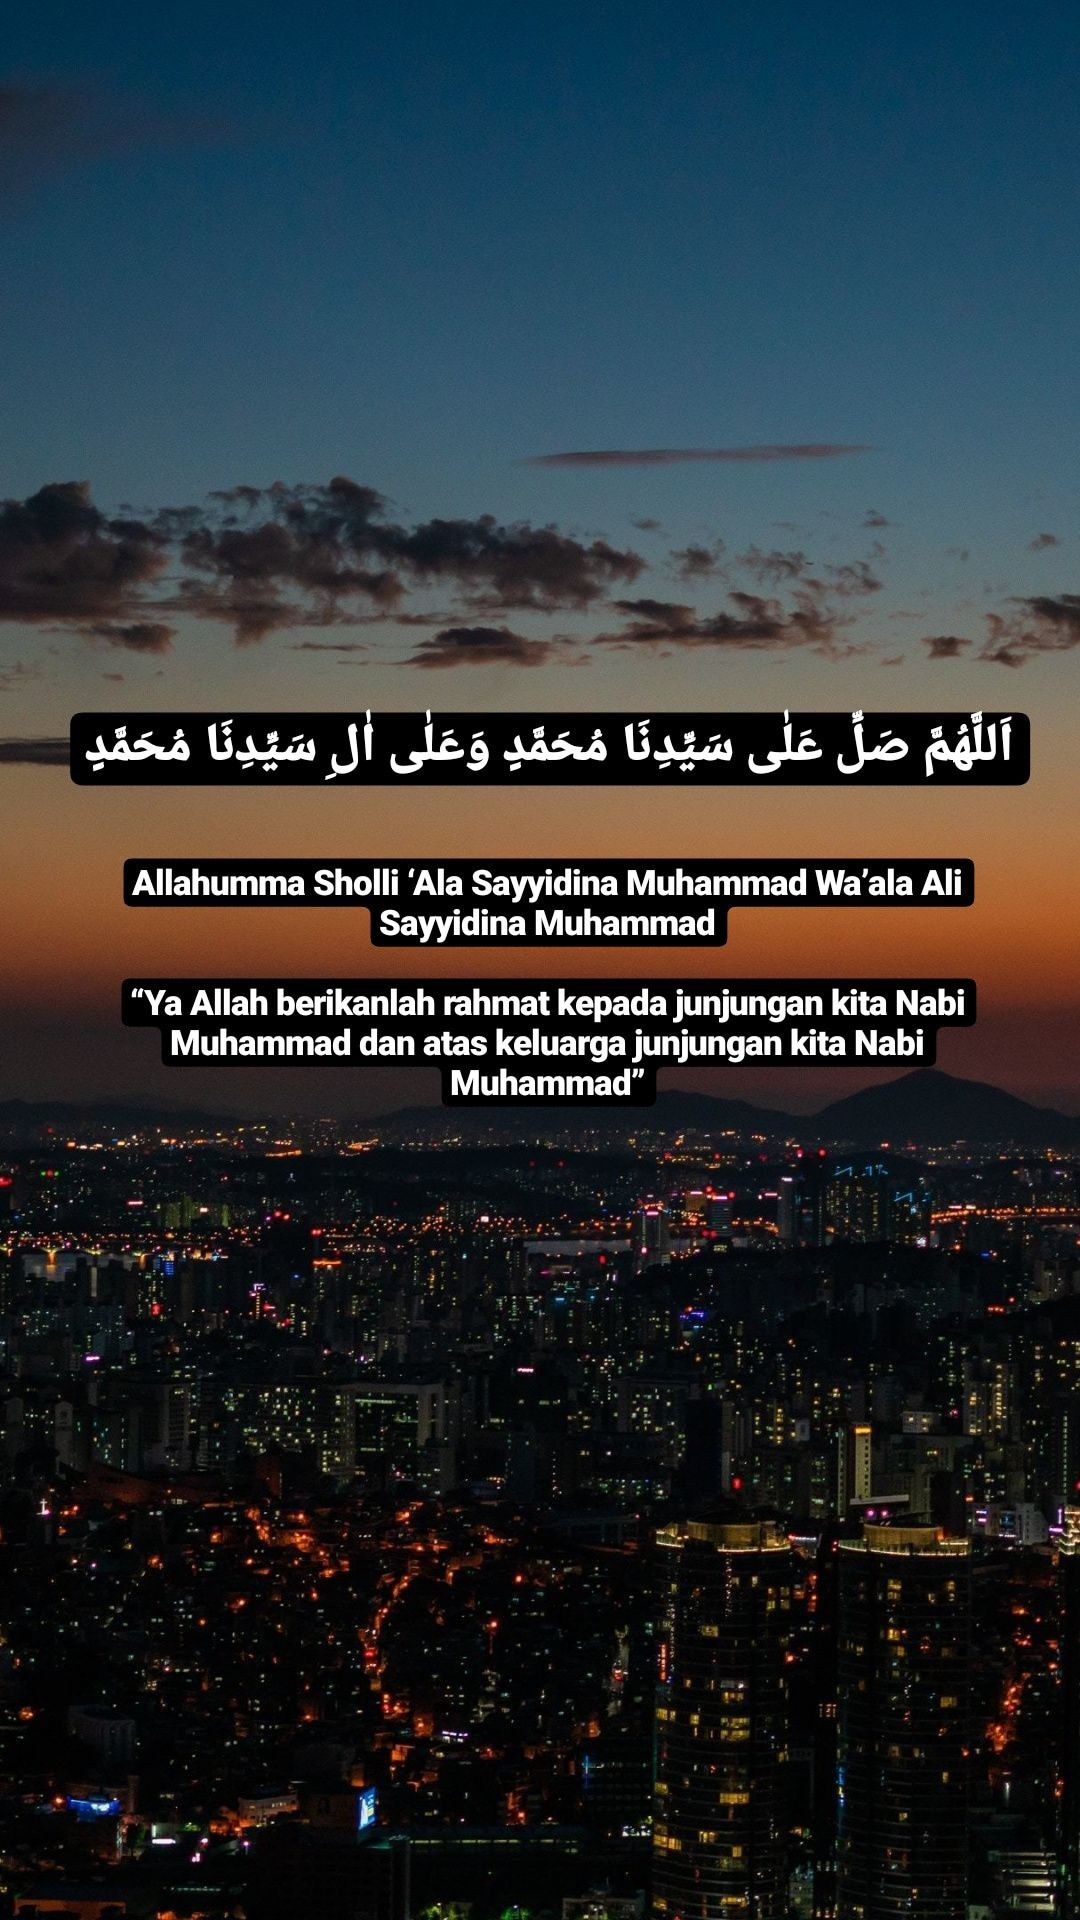 Allahumma Sholli 'Ala Sayyidina Muhammad Wa'ala Ali Sayyidina Muhammad